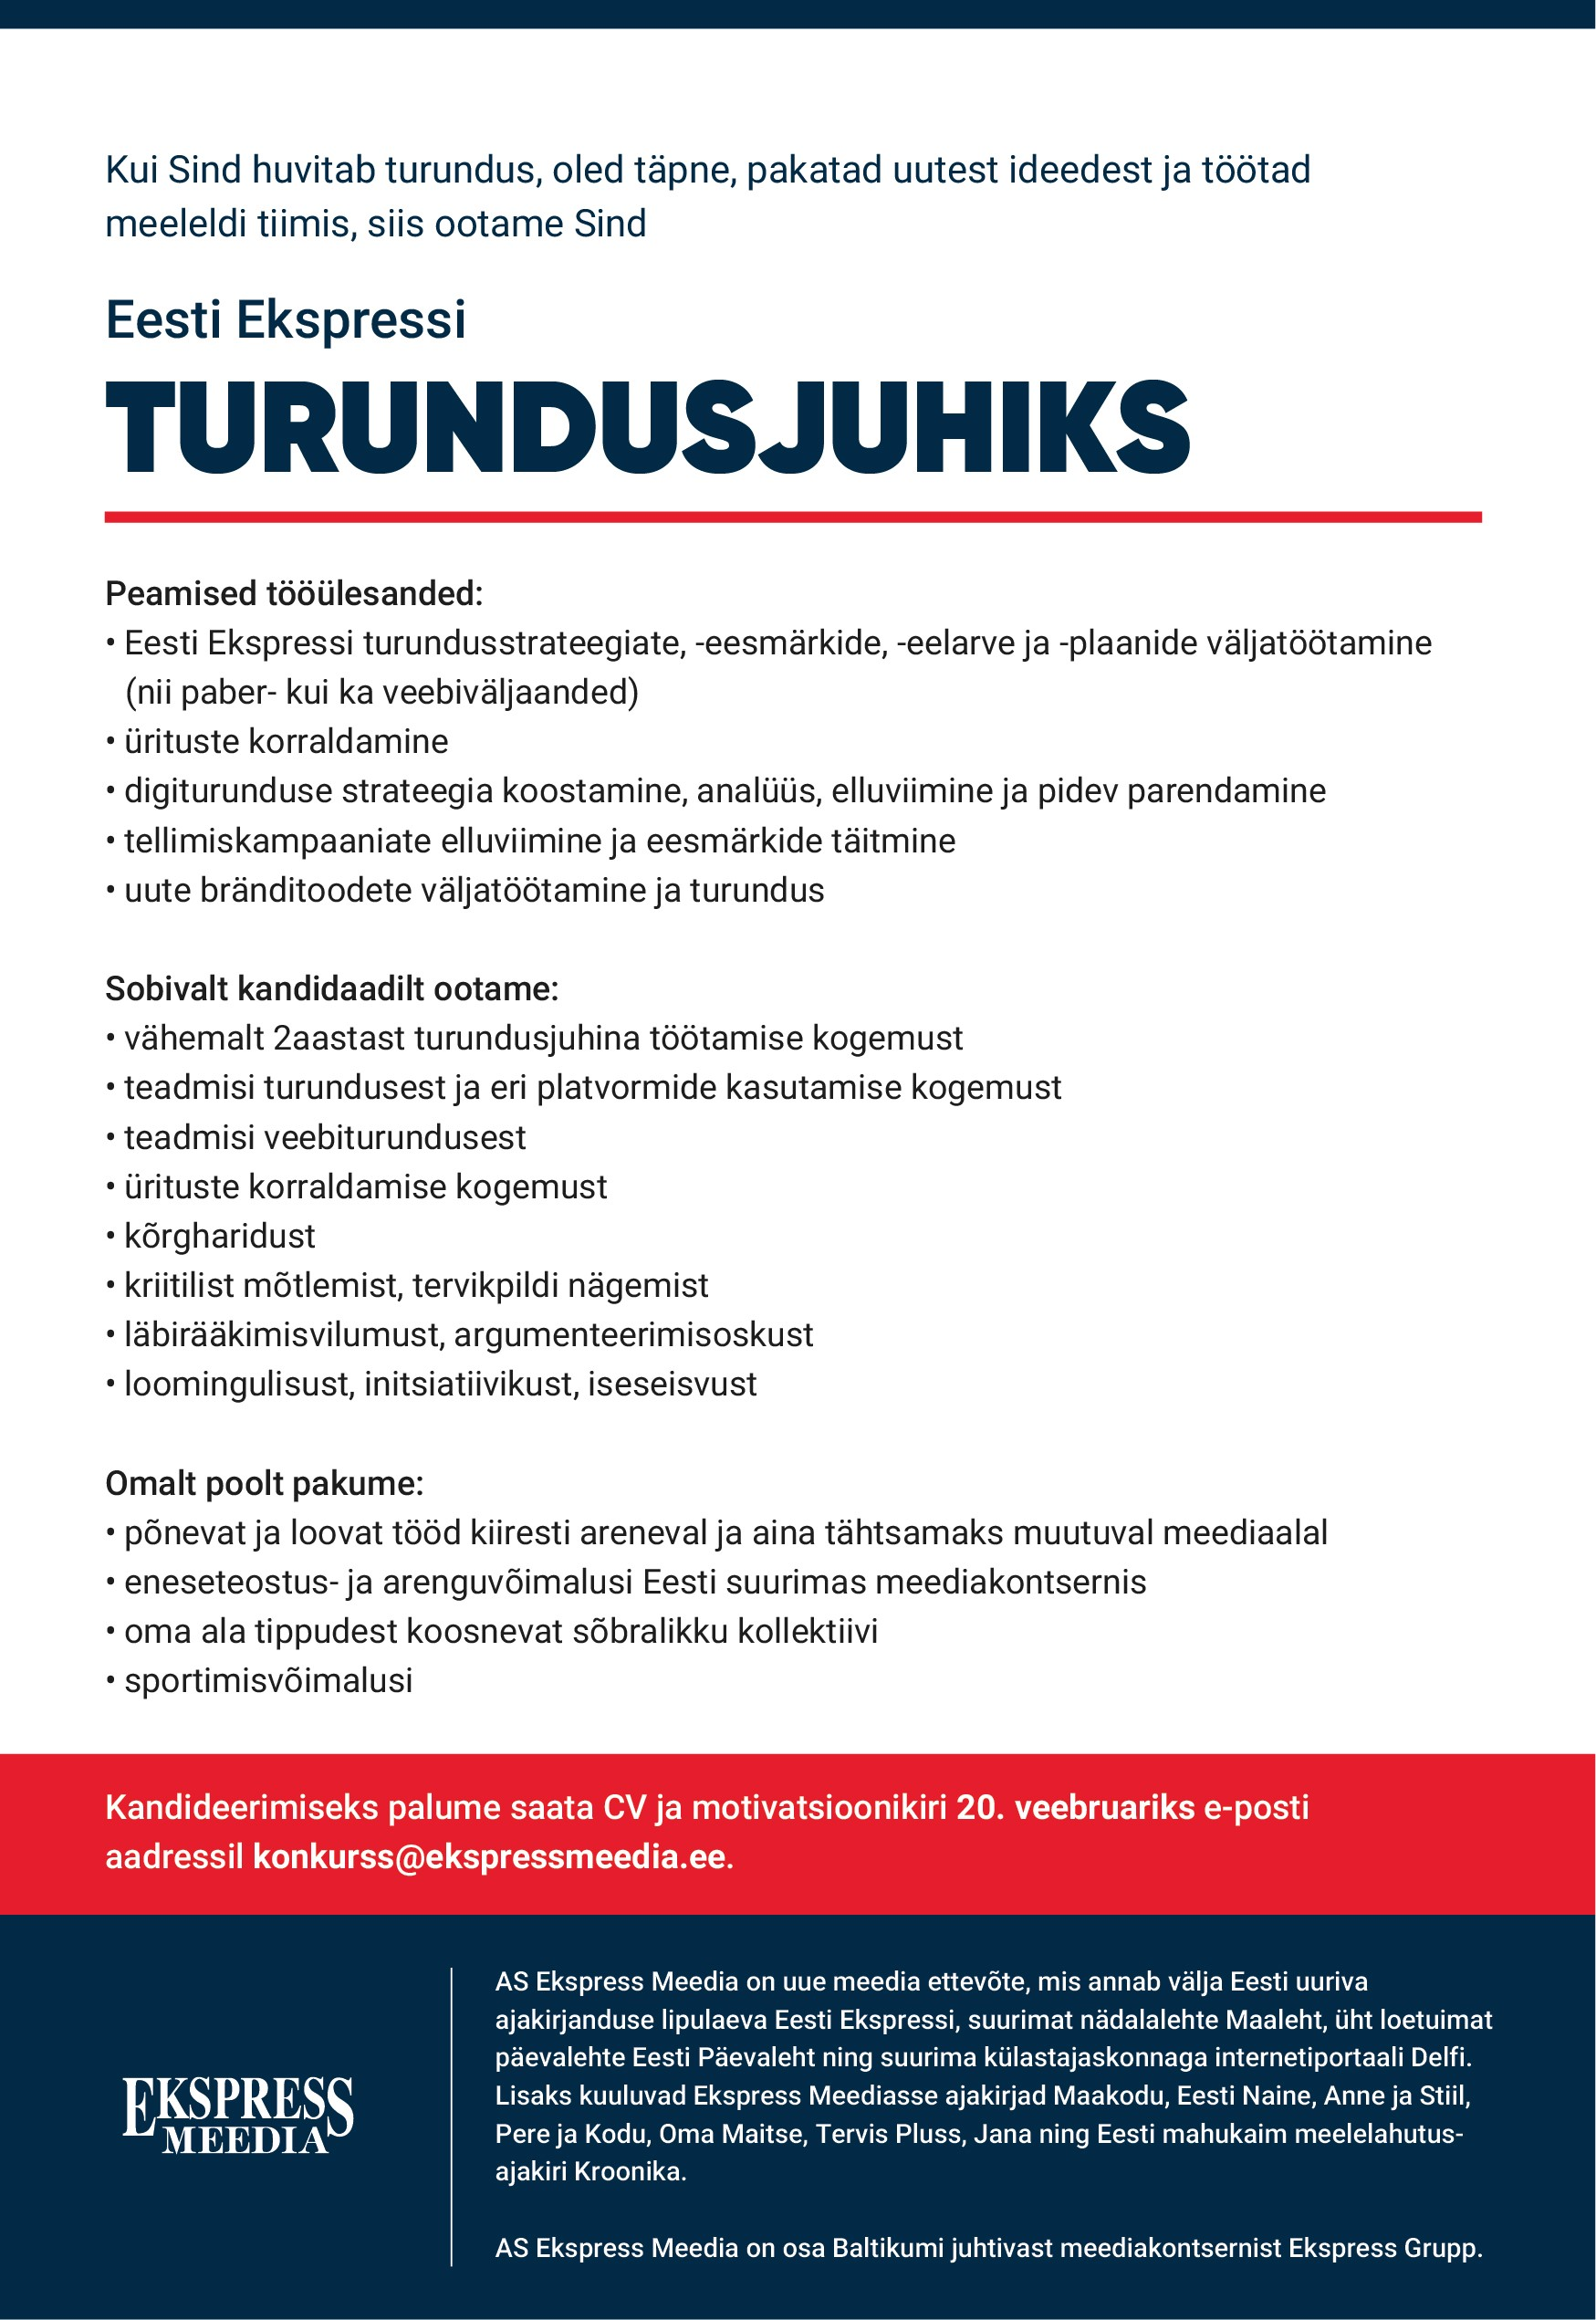 Eesti Ekspressi turundusjuht